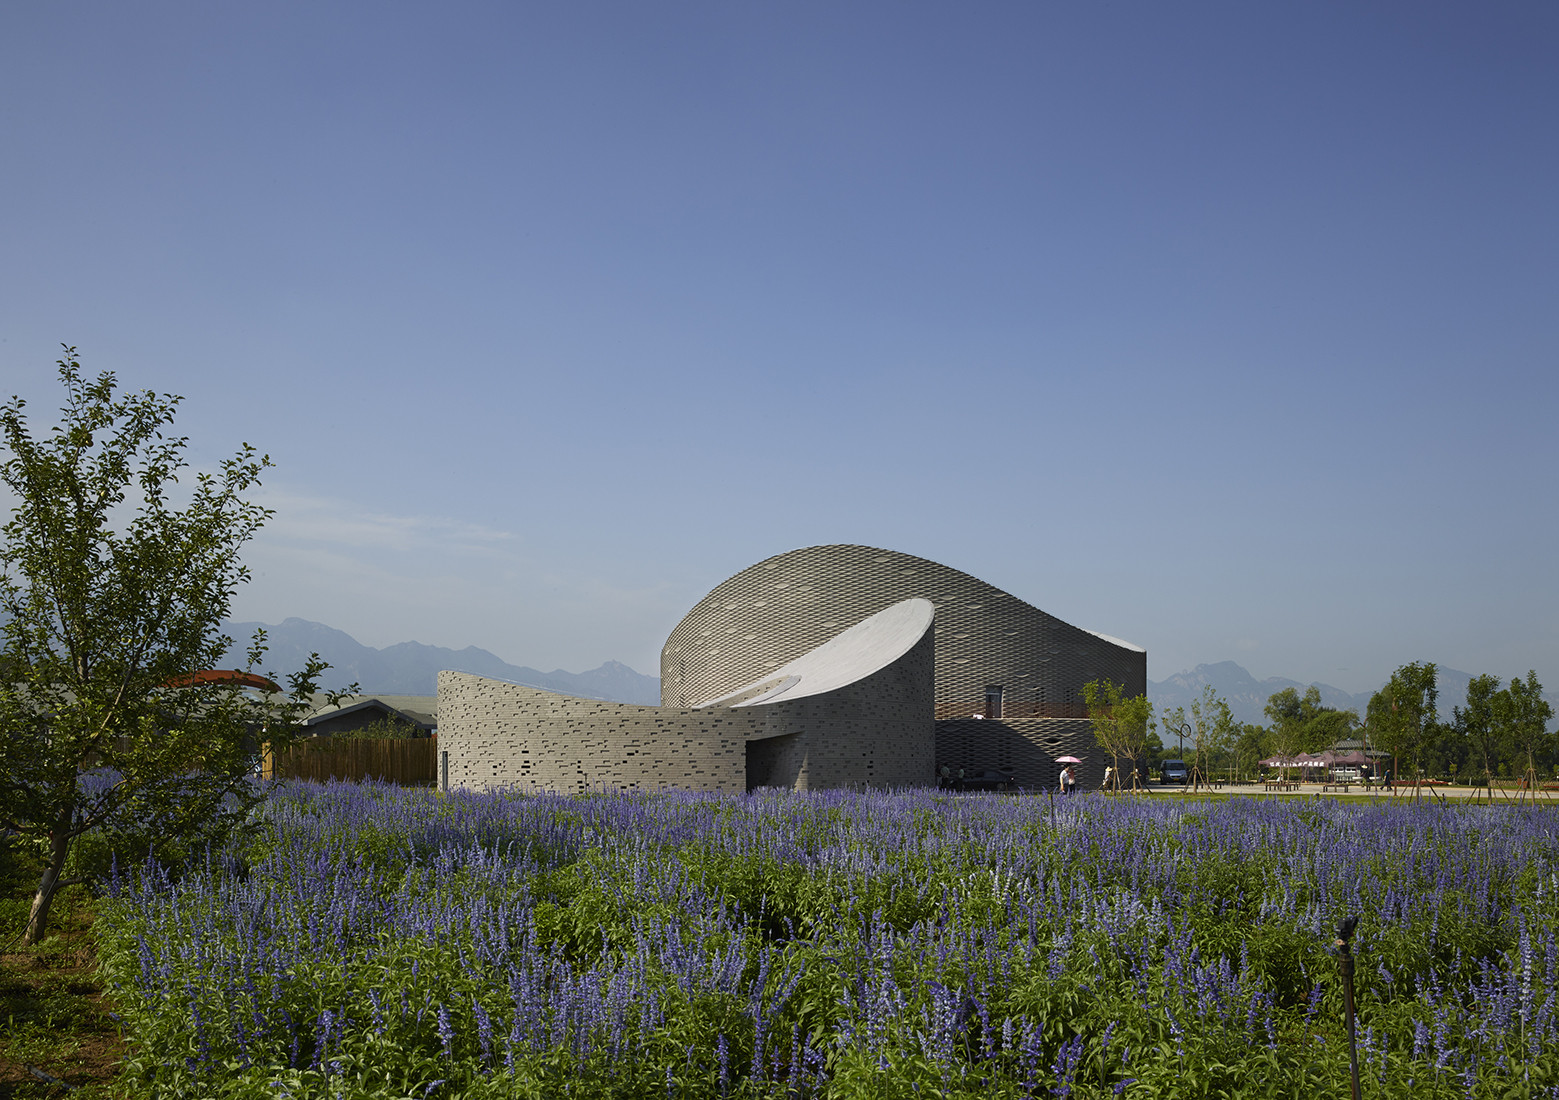 Exhibición de uva Yanqing / Archea Associati, © Cristiano Bianchi